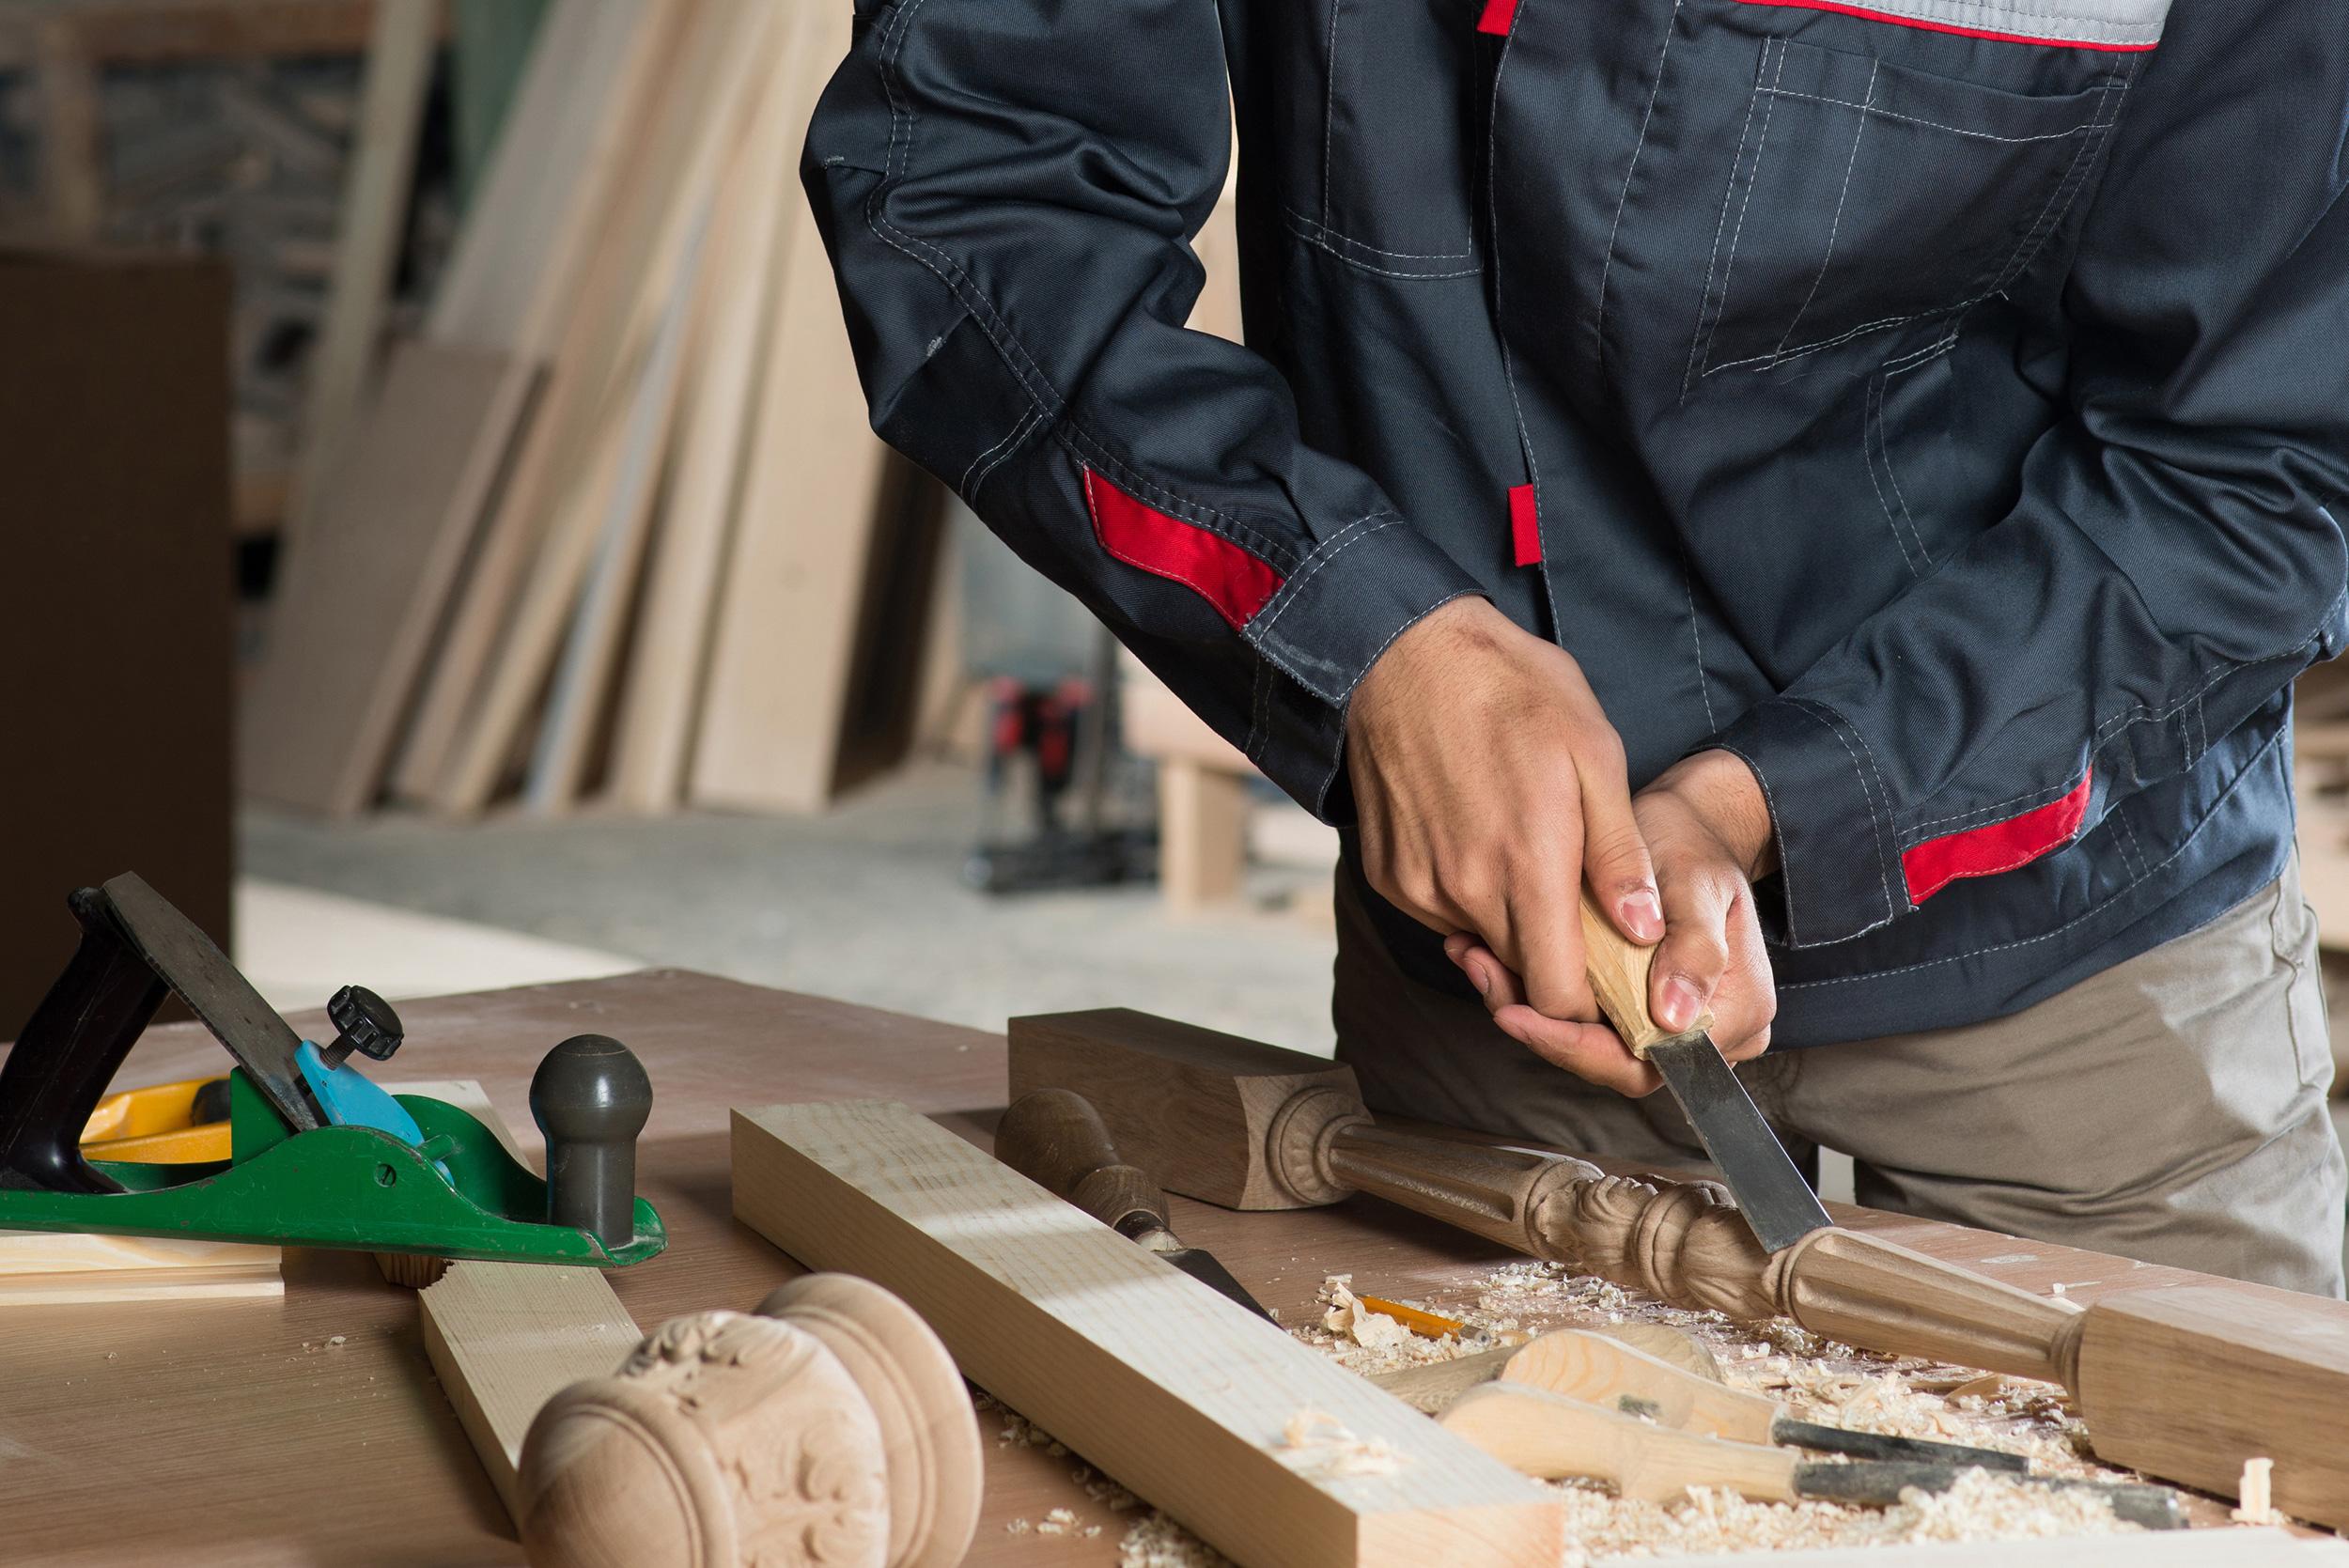 Carpenter using wood tools